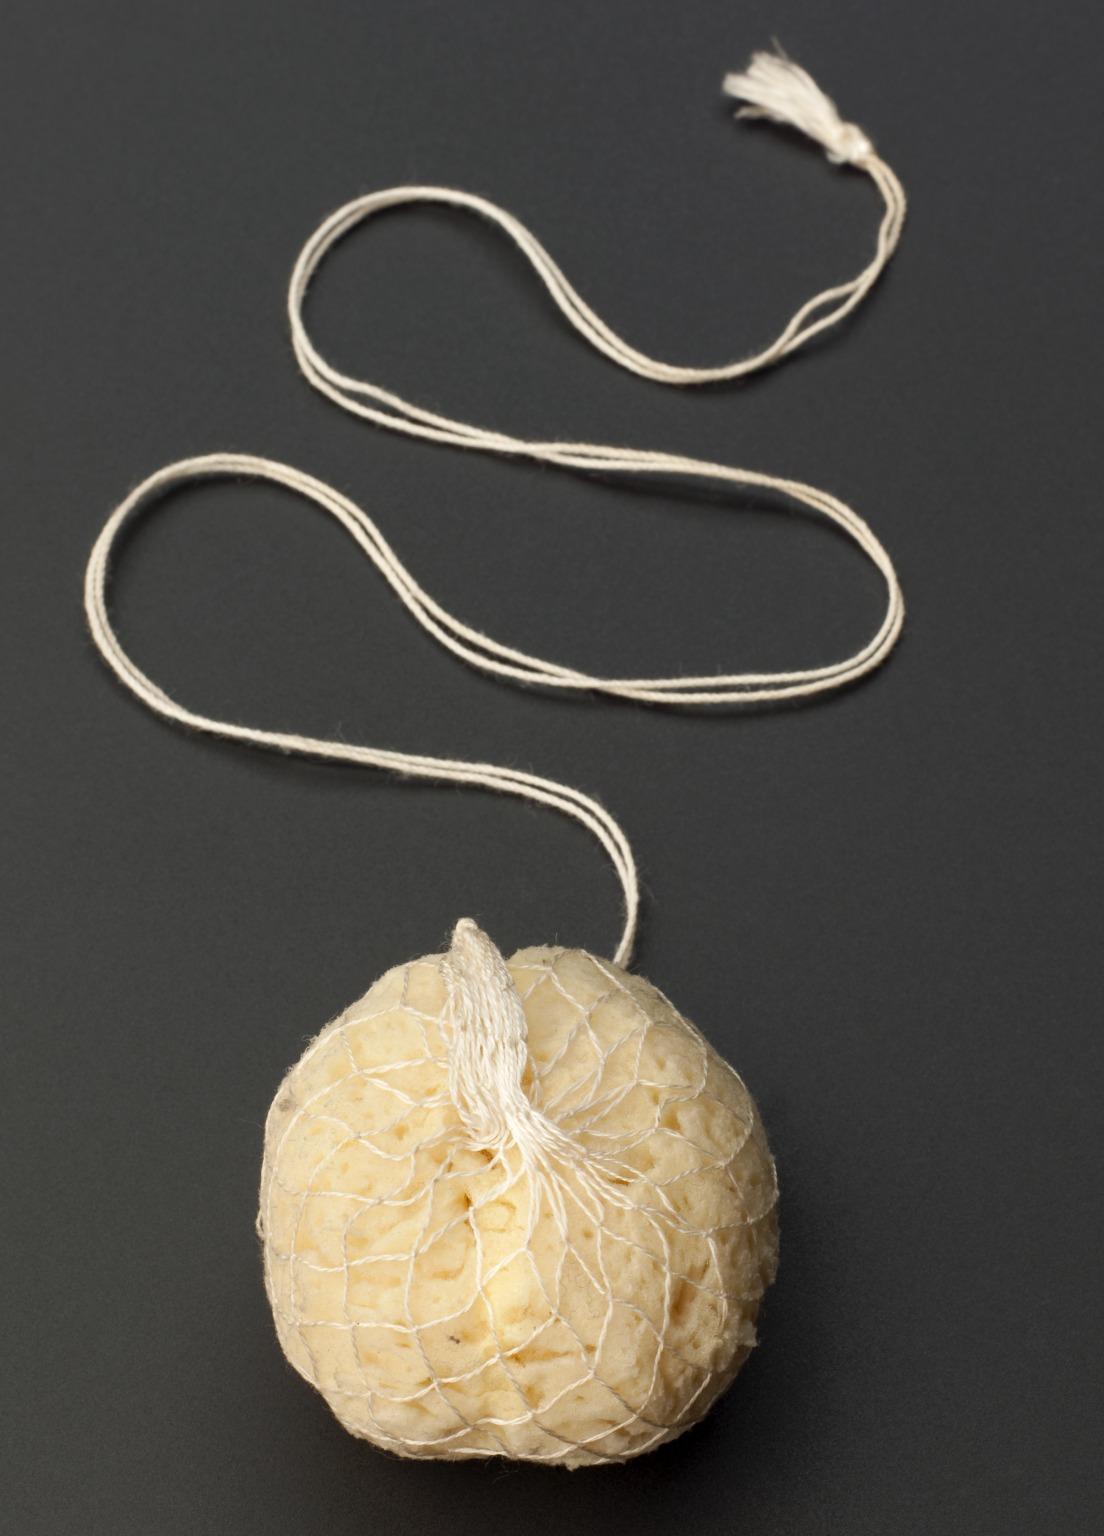 Contraceptive sponge